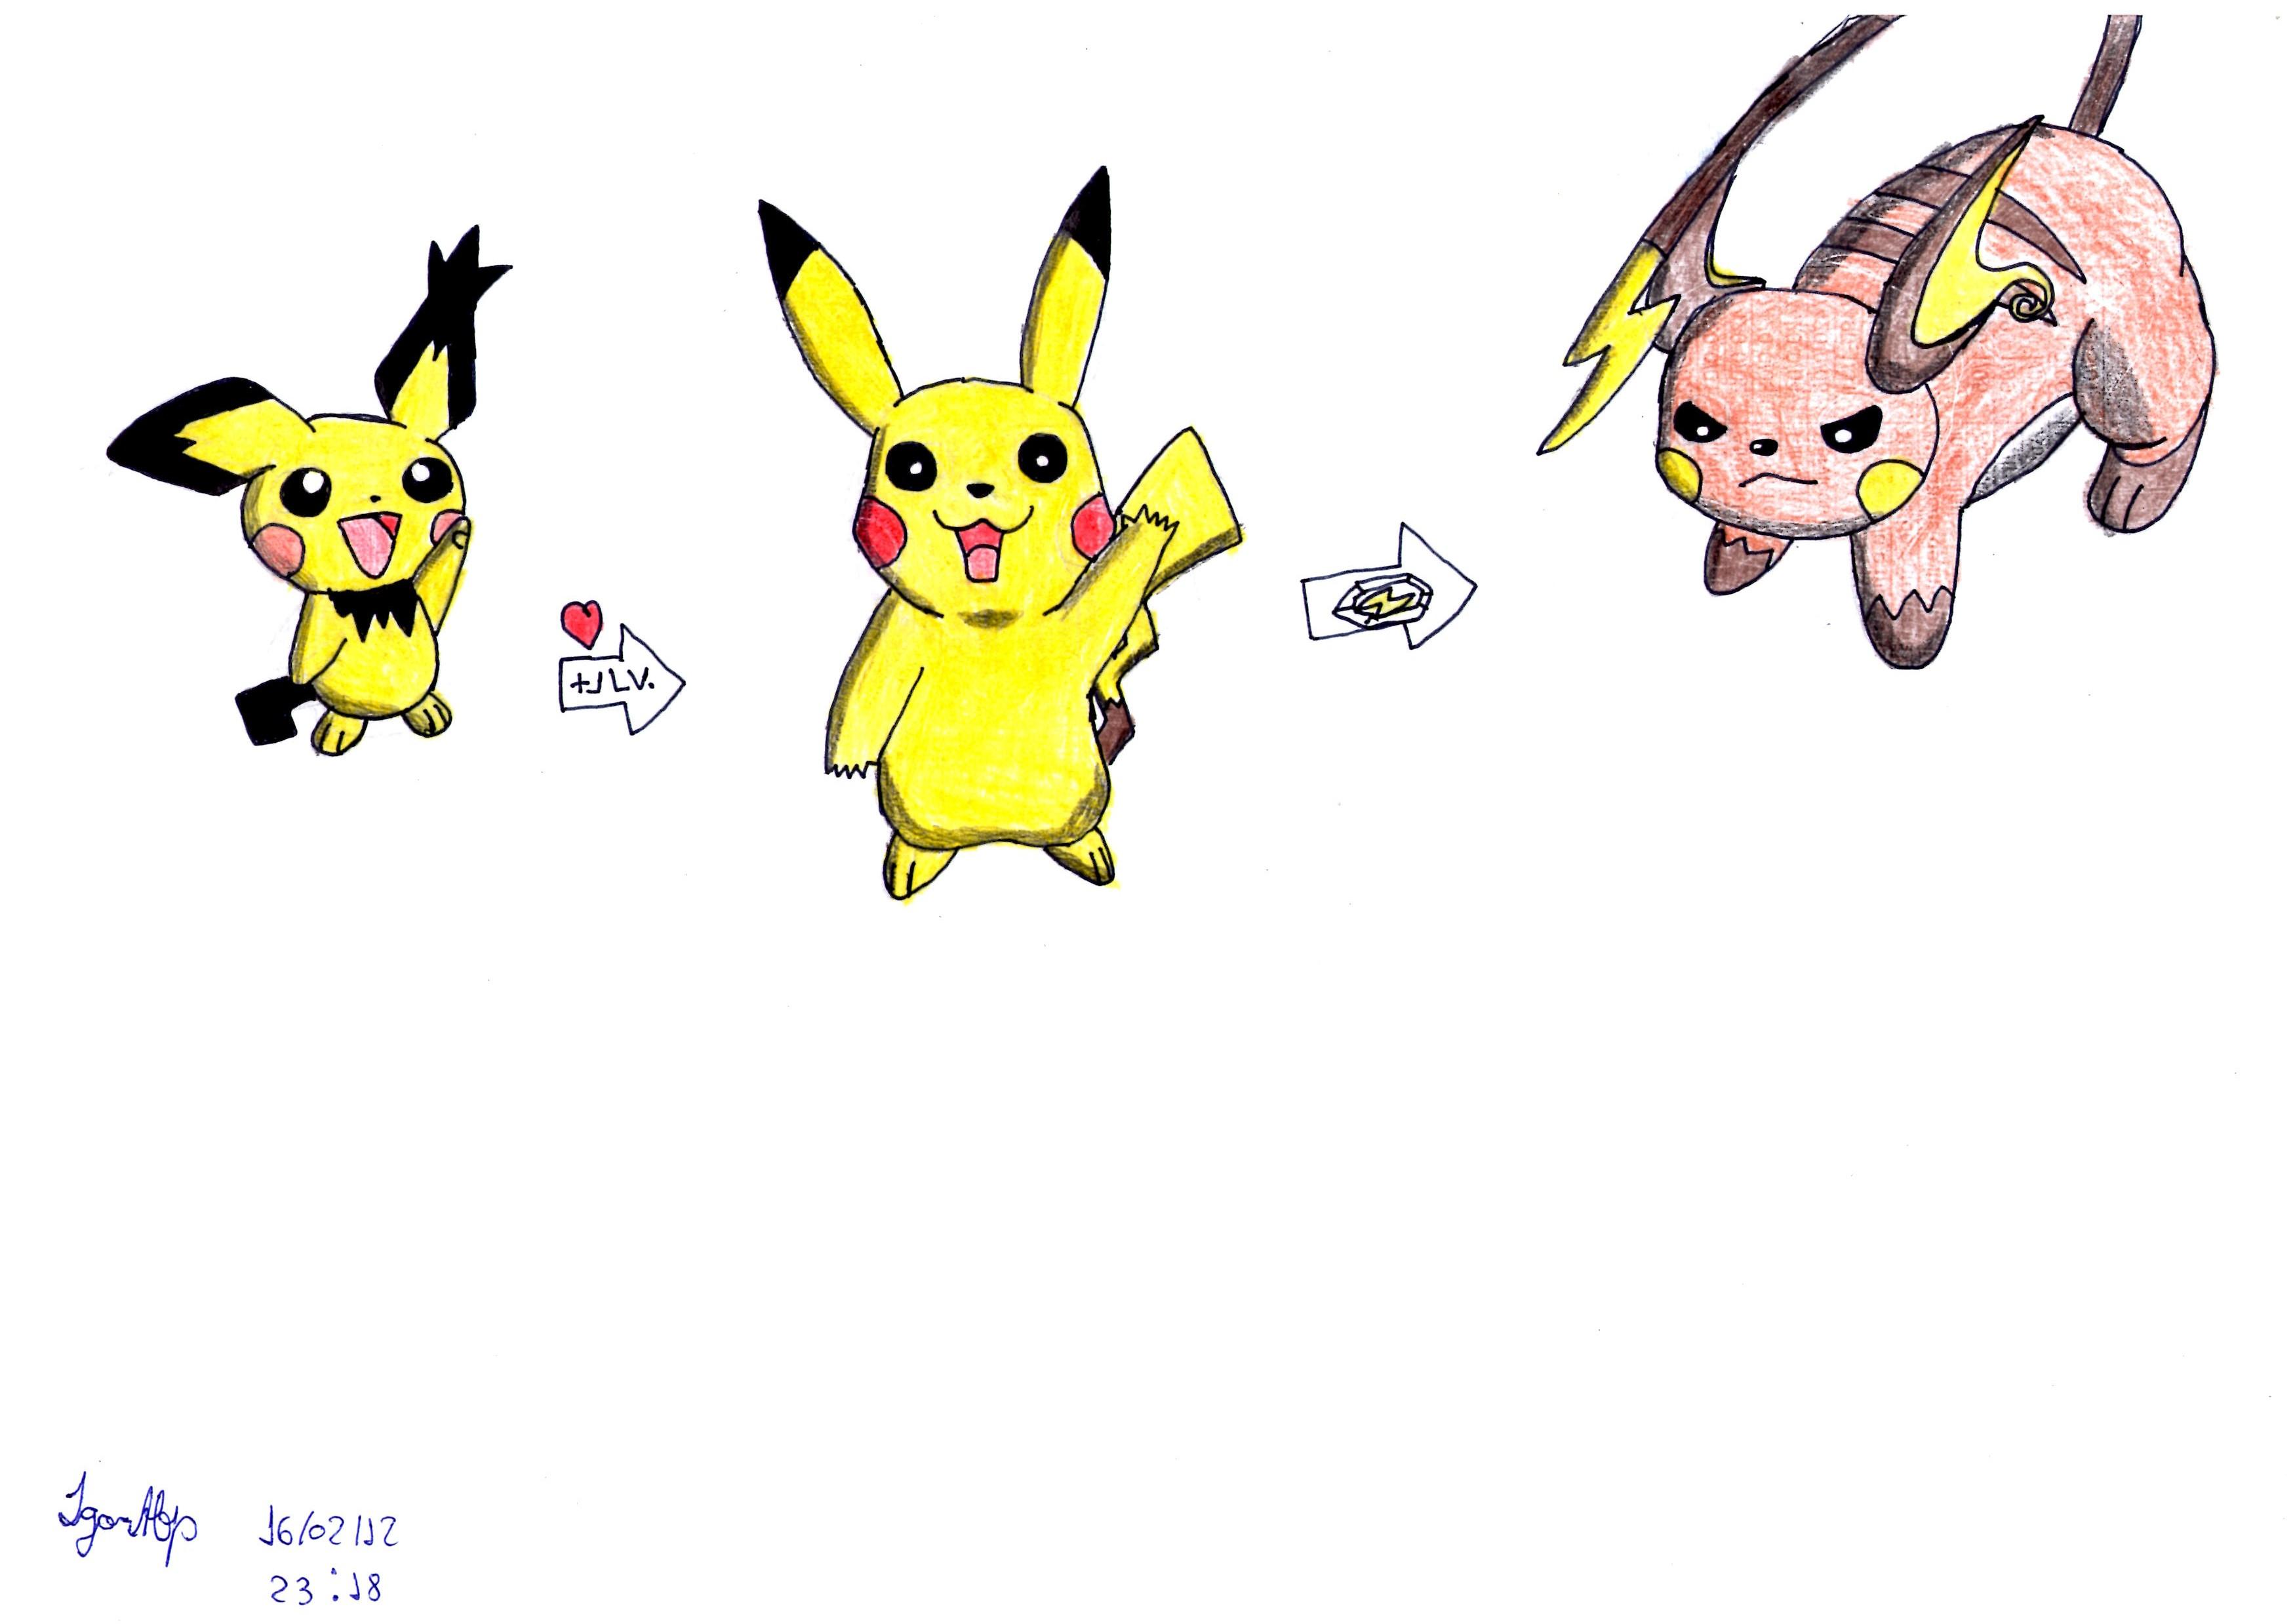 Pikachu evolutions by Pokecrz on DeviantArt